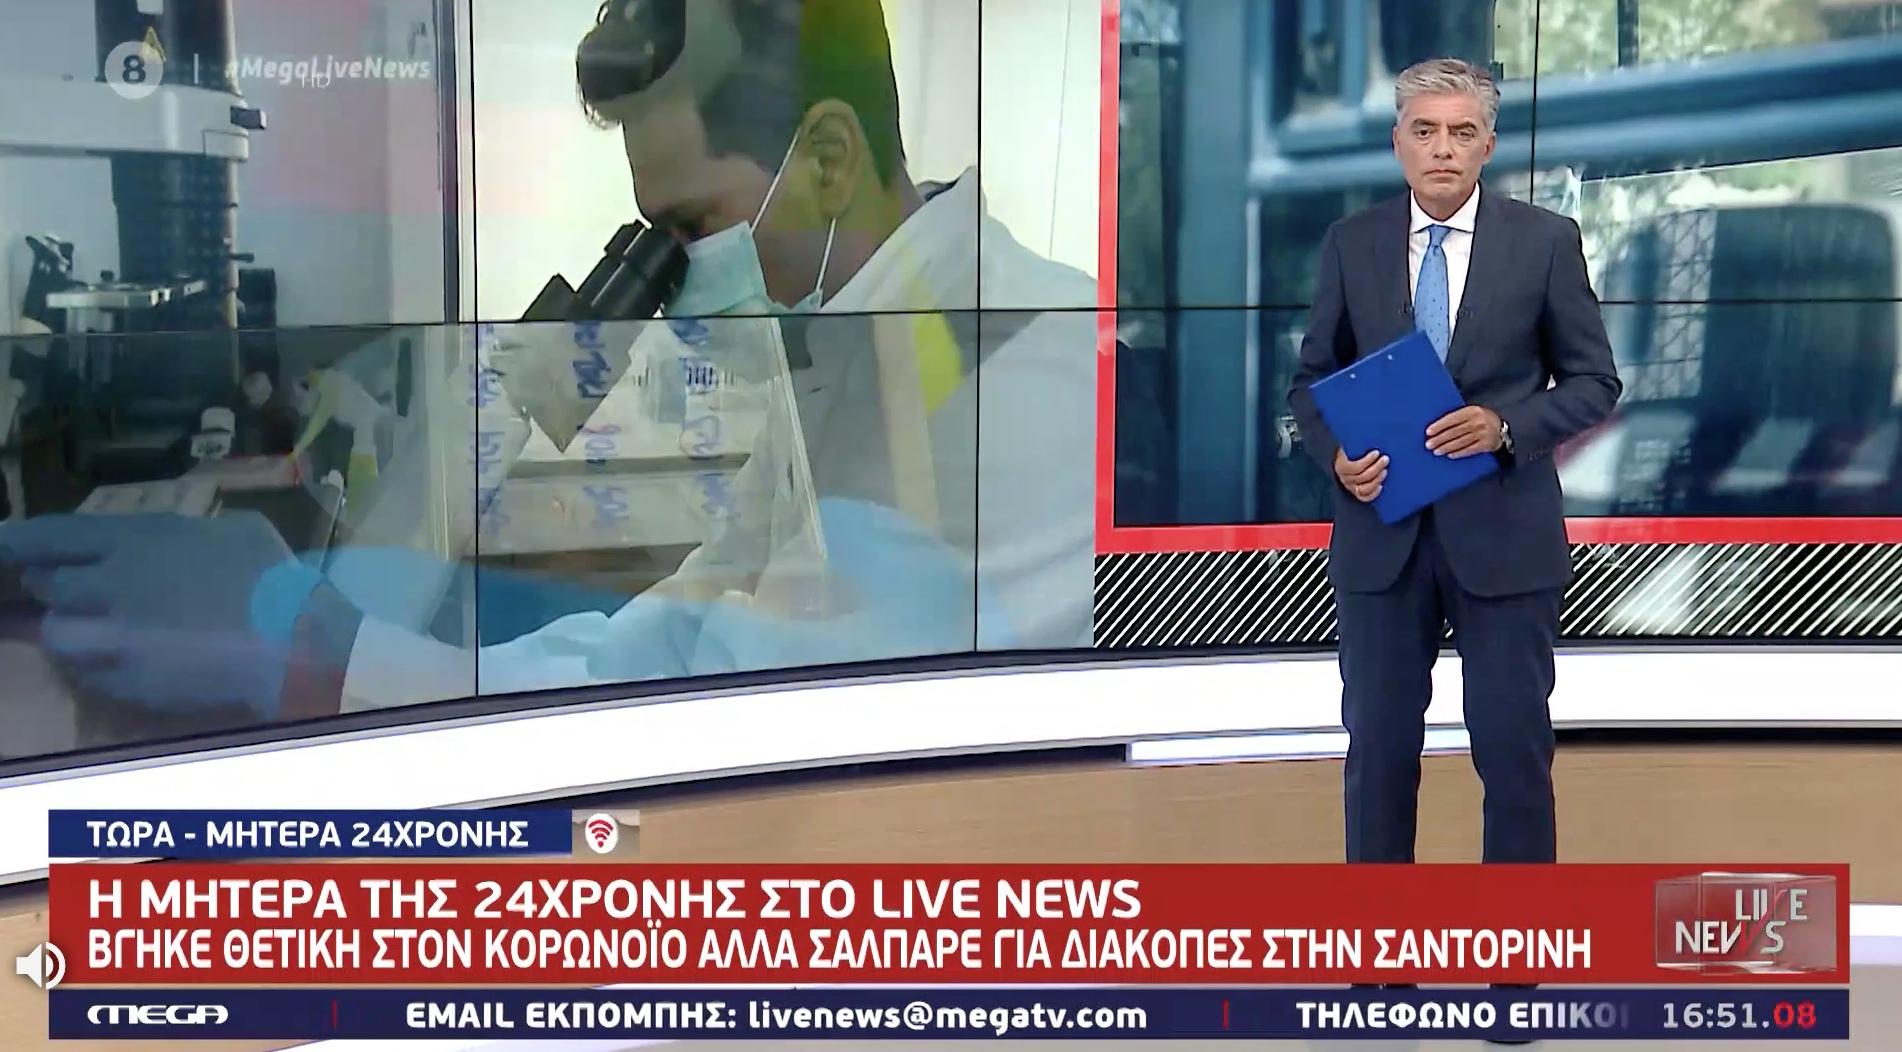 Live News: Μητέρα 24χρονης που ταξίδεψε στη Σαντορίνη ενώ ήταν θετική: «Αμφιβάλλω αν υπάρχει κορονοϊός»